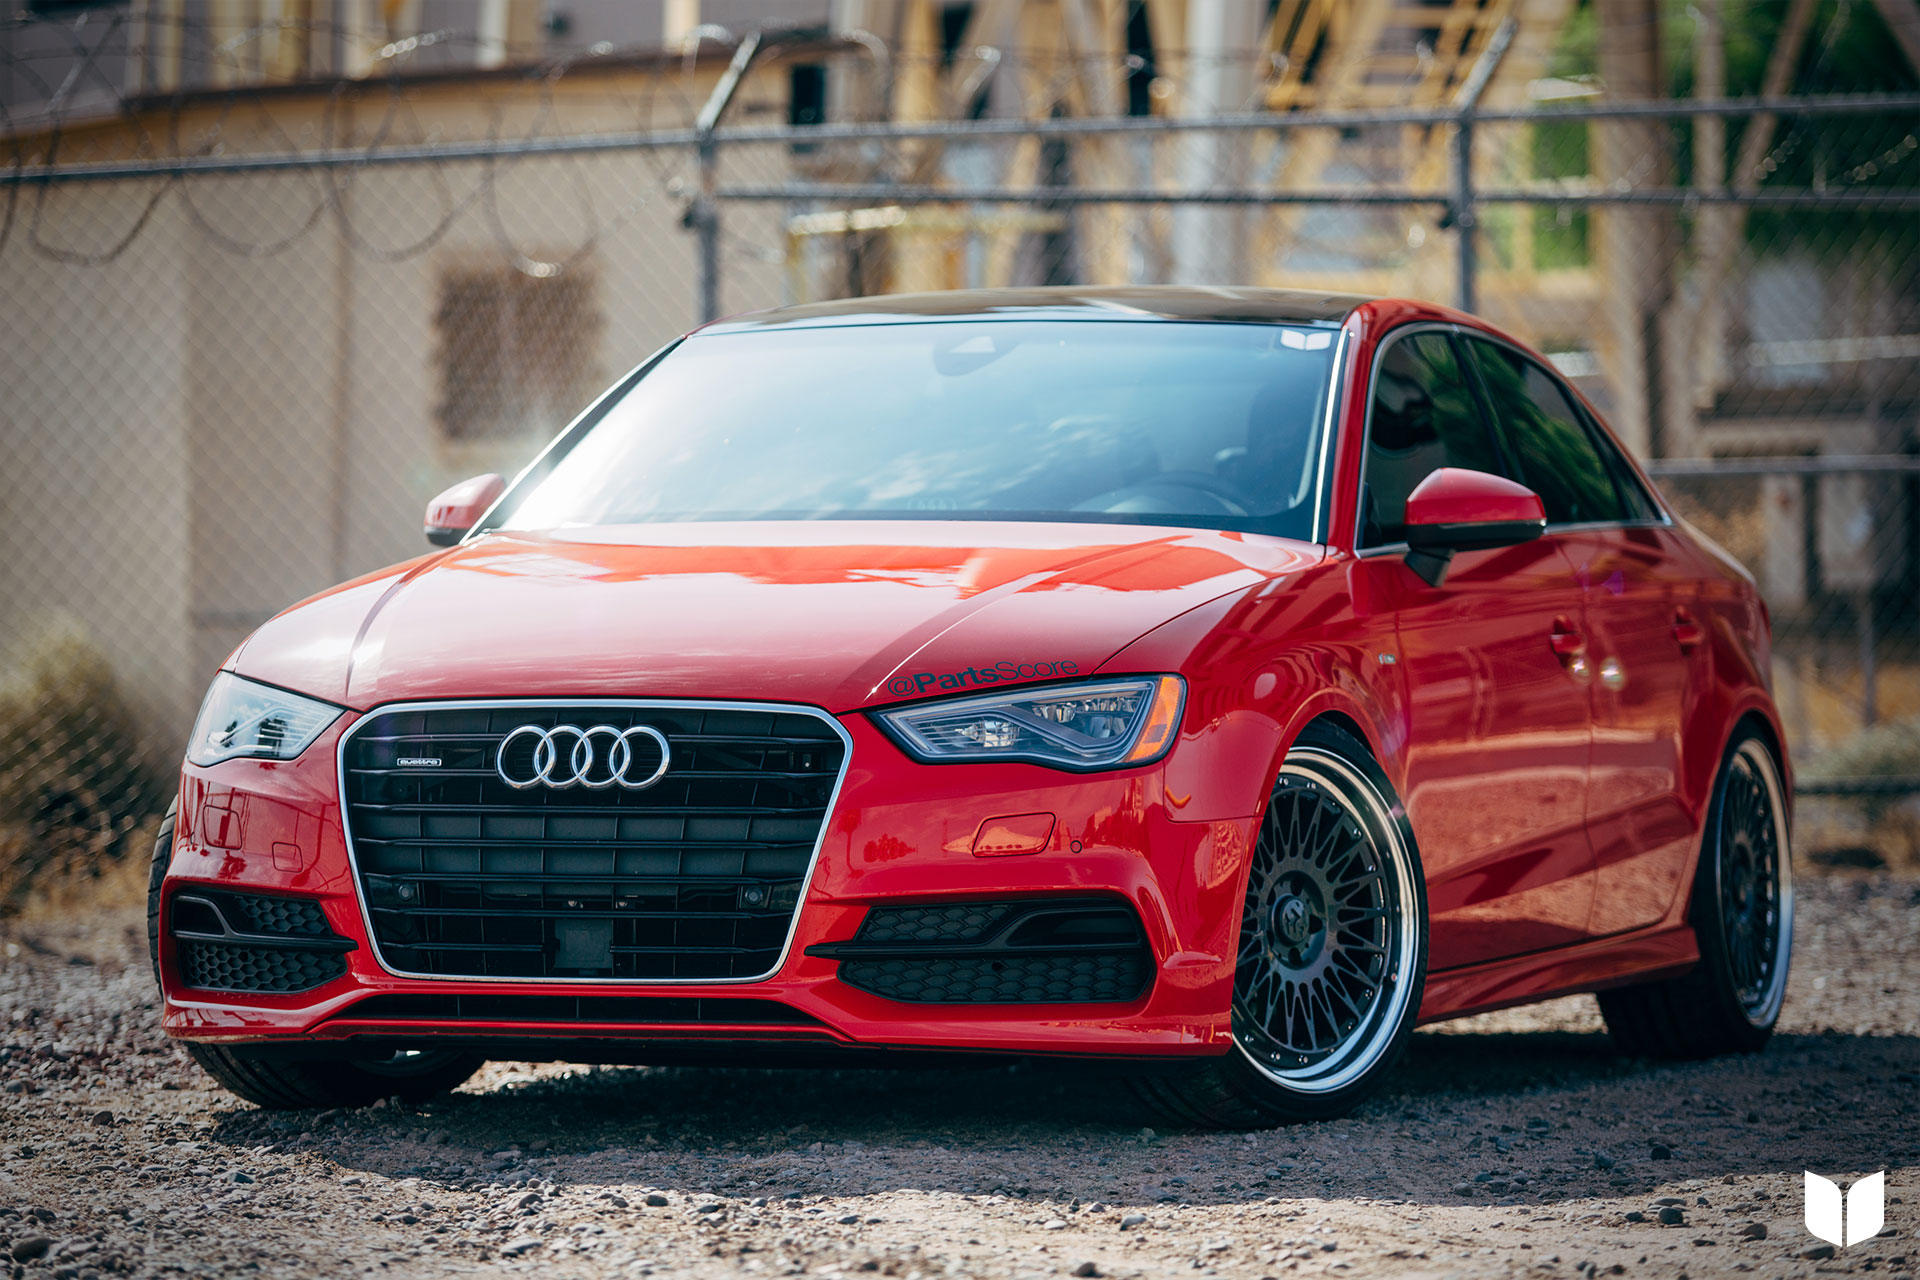 2015 Audi 8V A3 quattro Sport fifteen52 Michelin Parts Score Scottsdale